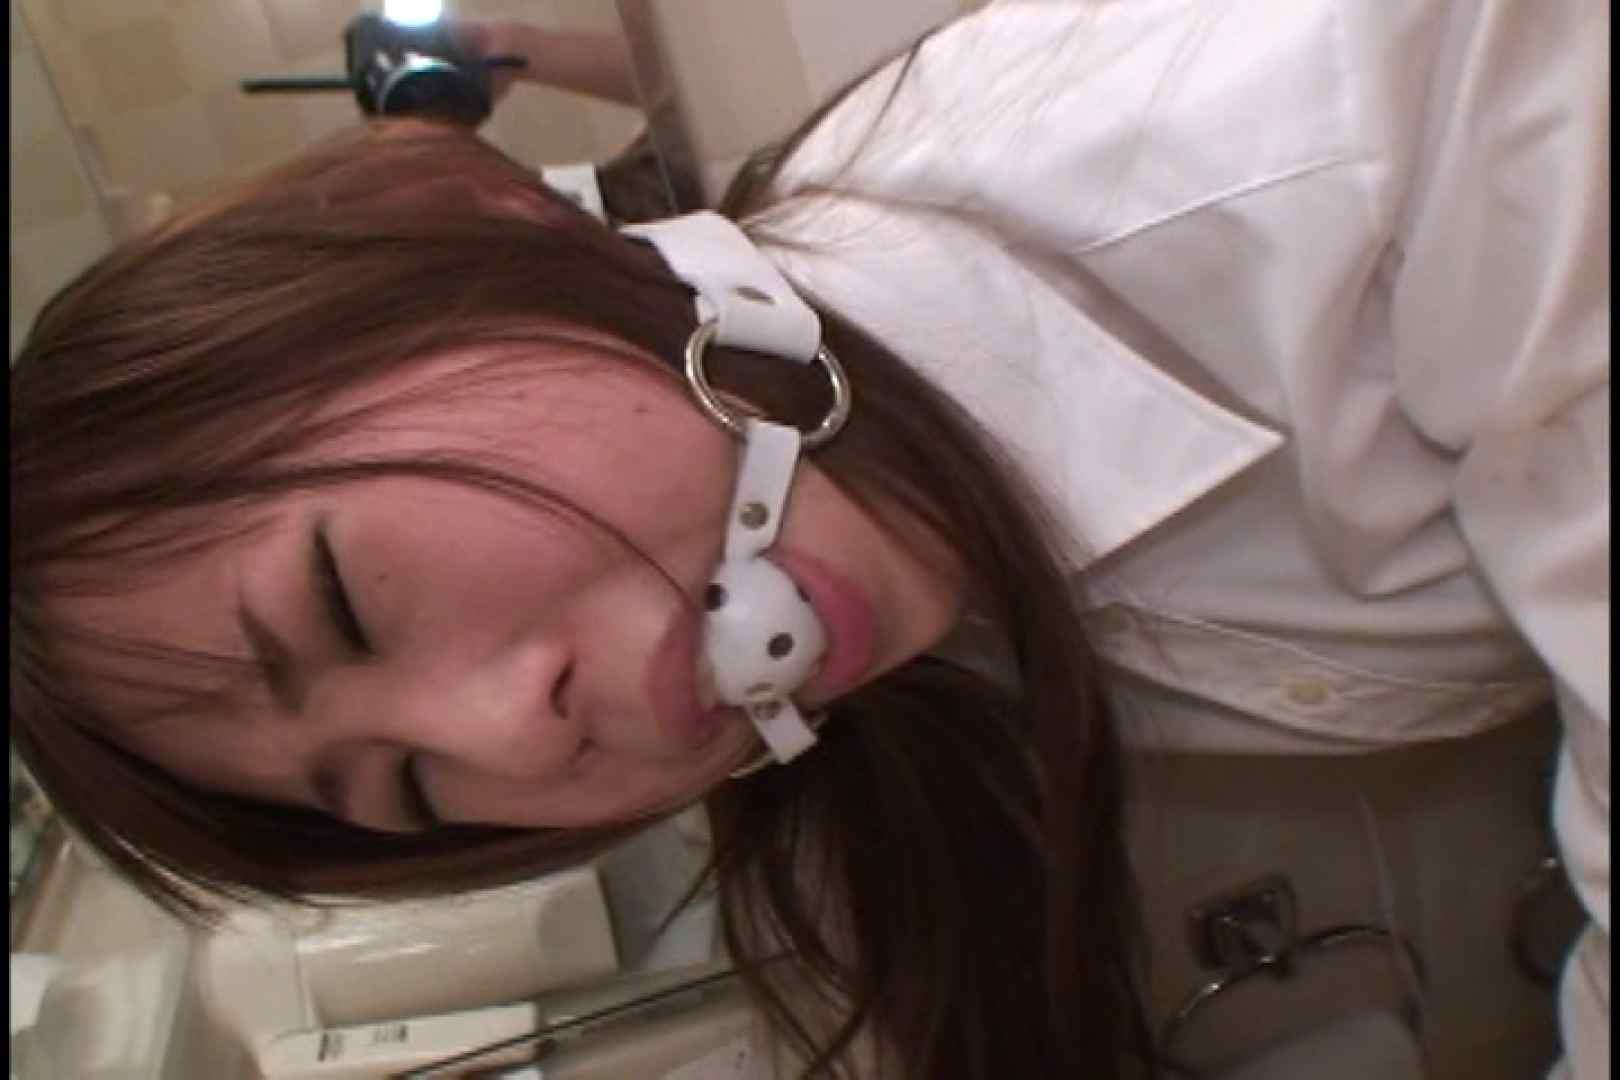 JDハンター全国ツアー vol.020 後編 女子大生のエロ動画  79PIX 46